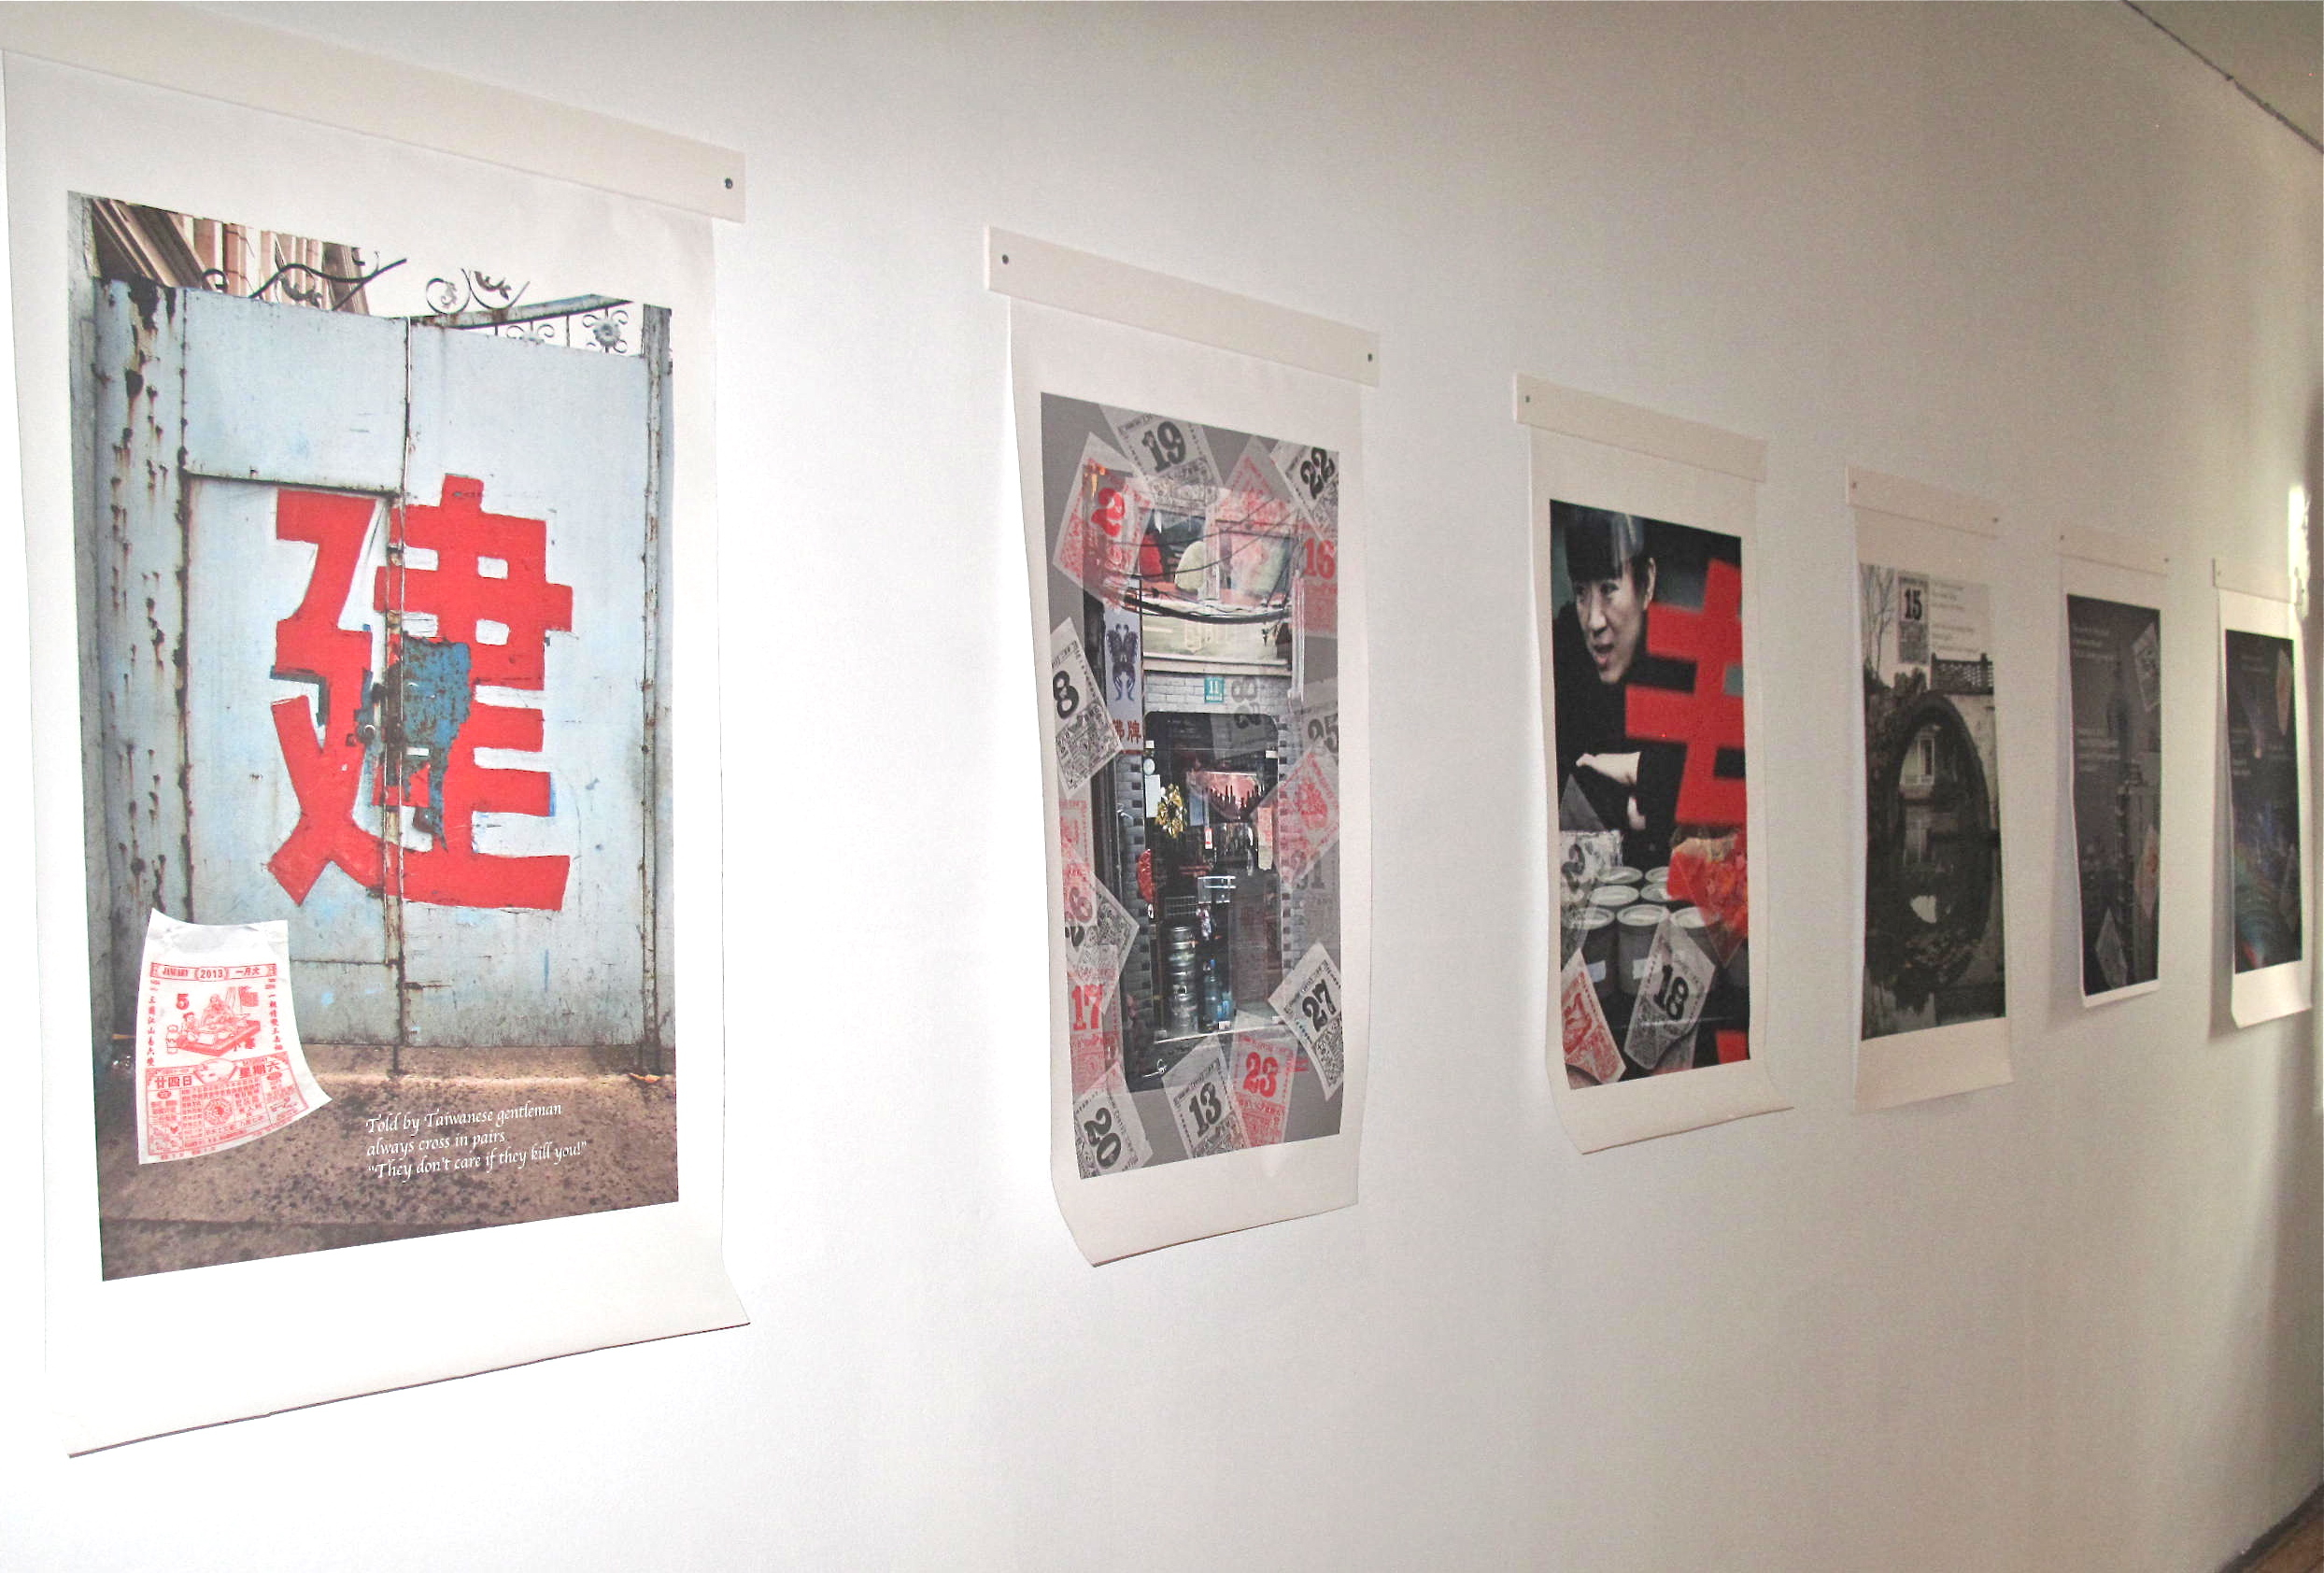 Sara Petitt, On the Wall Installation 1.jpg